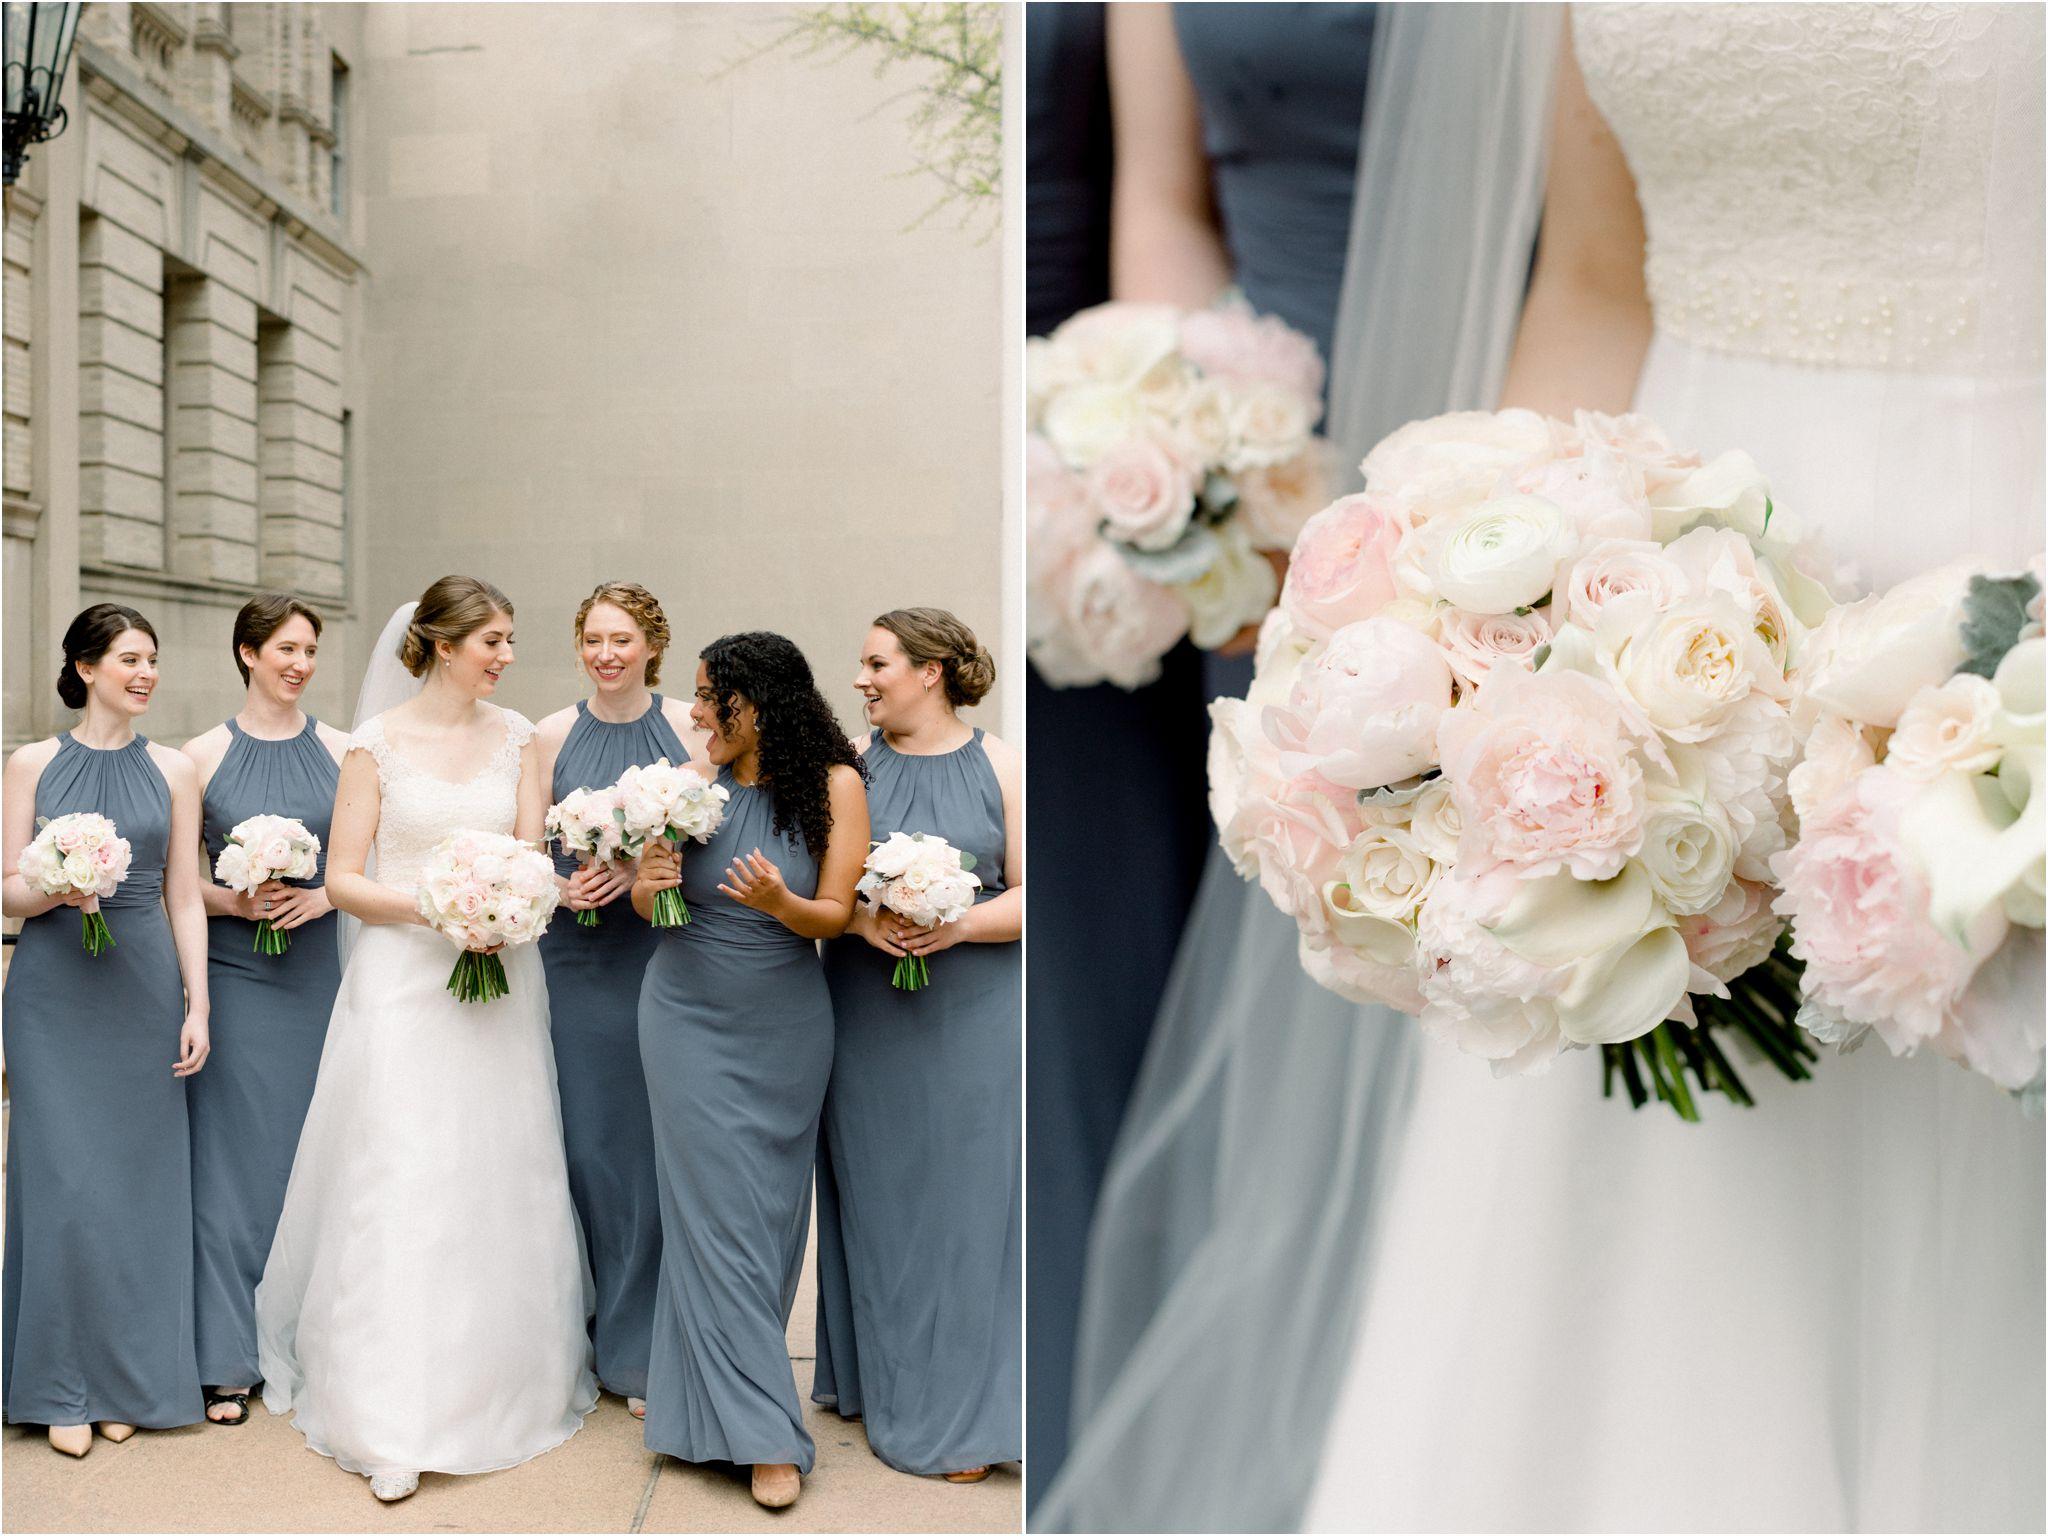 providence-public-library-wedding-images_00018.JPG